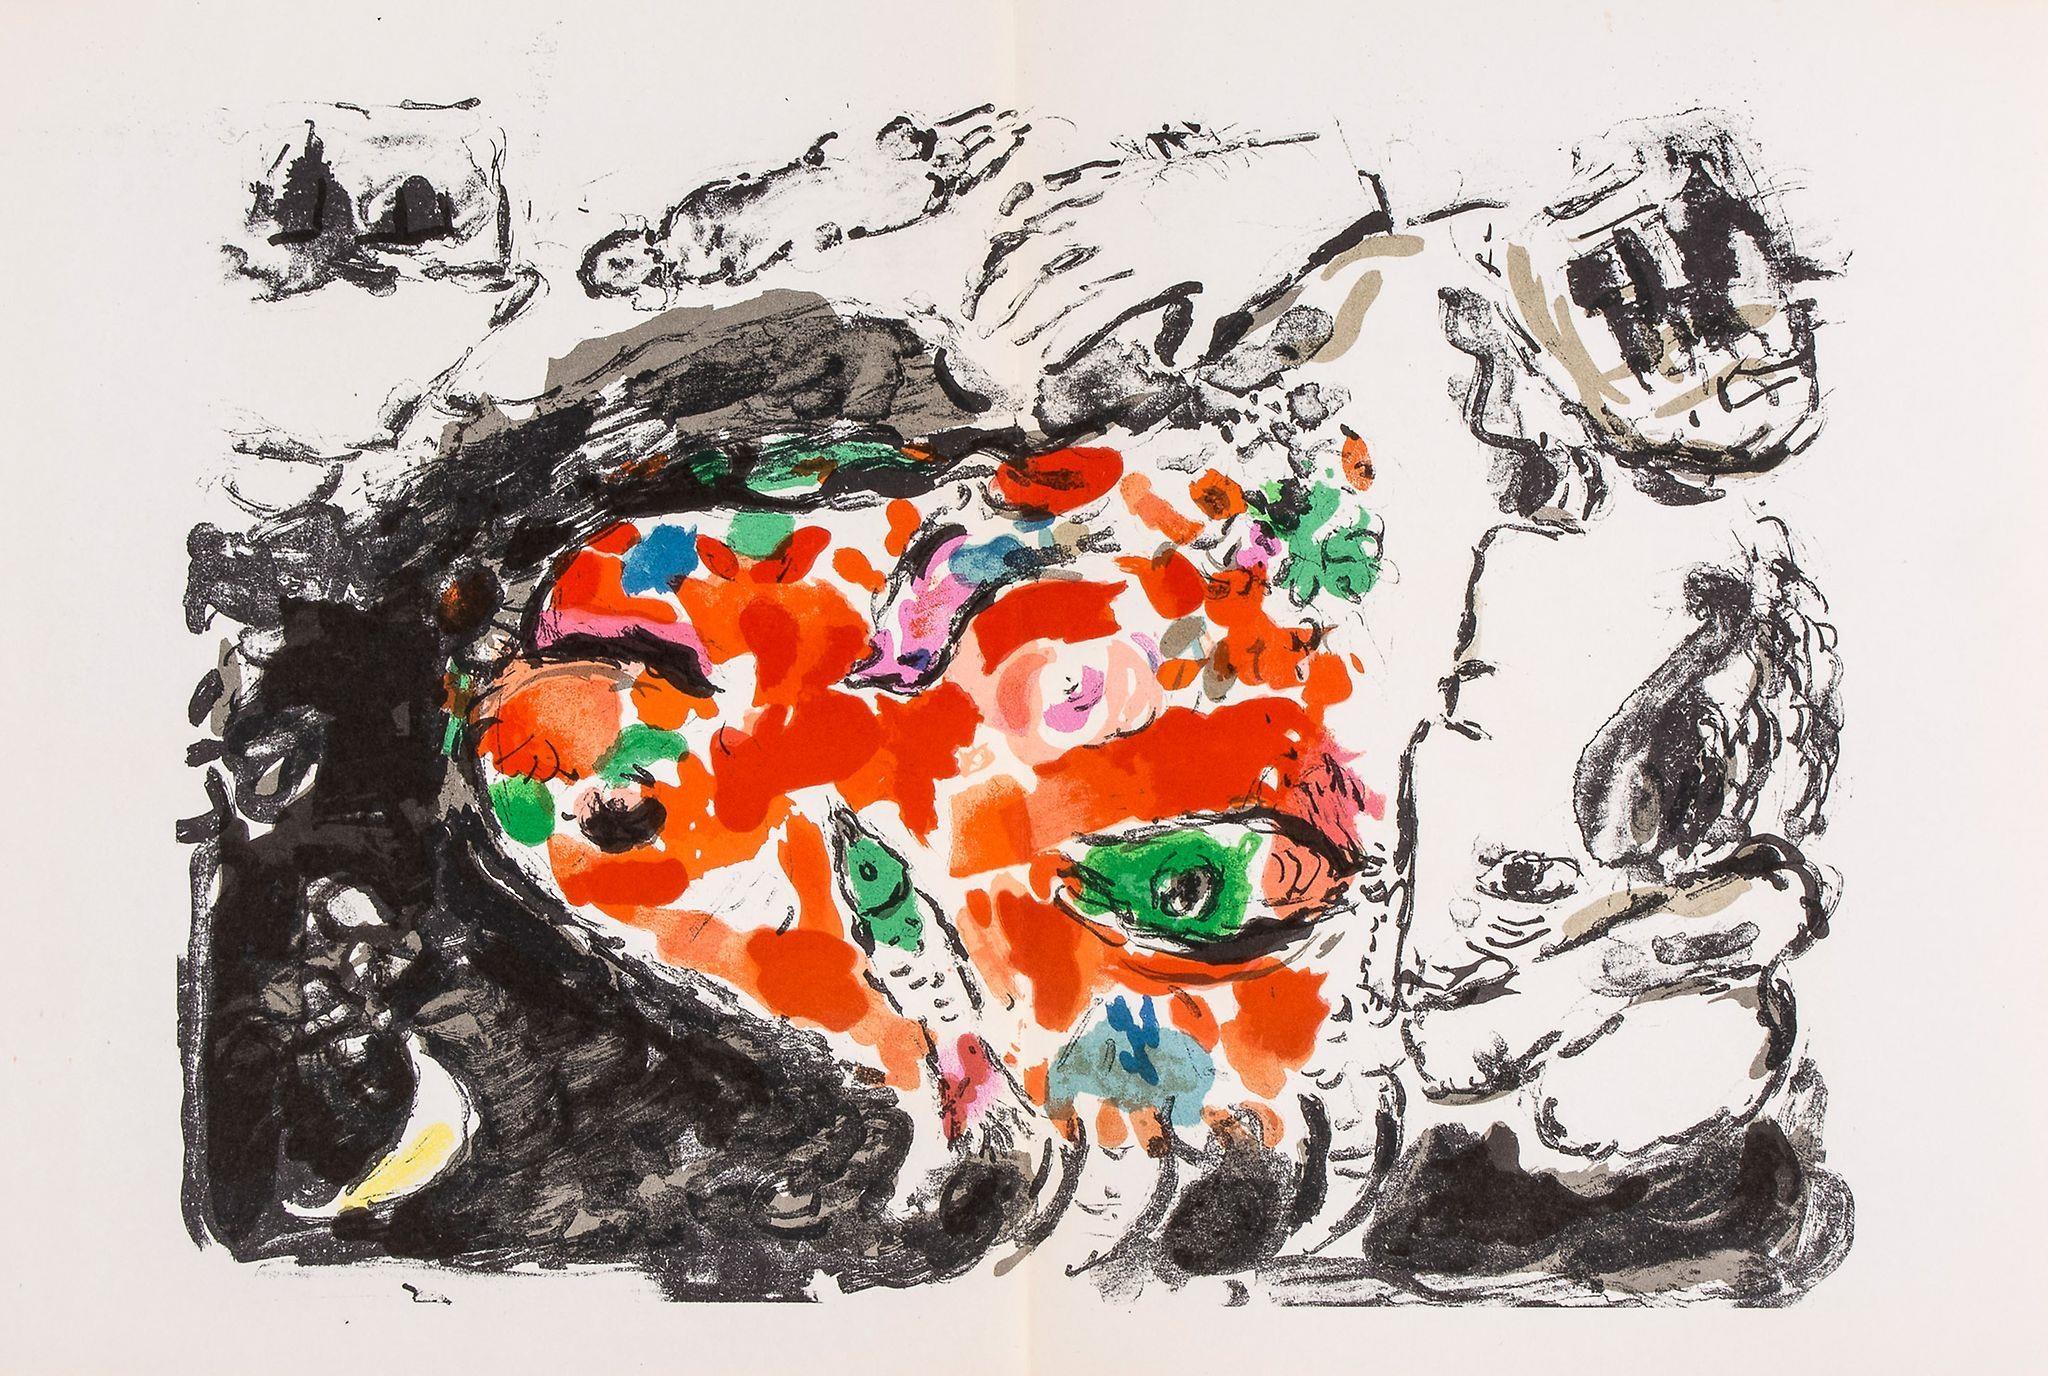 Marc chagall derri re le miroir no 198 1972 for Marc chagall derriere le miroir